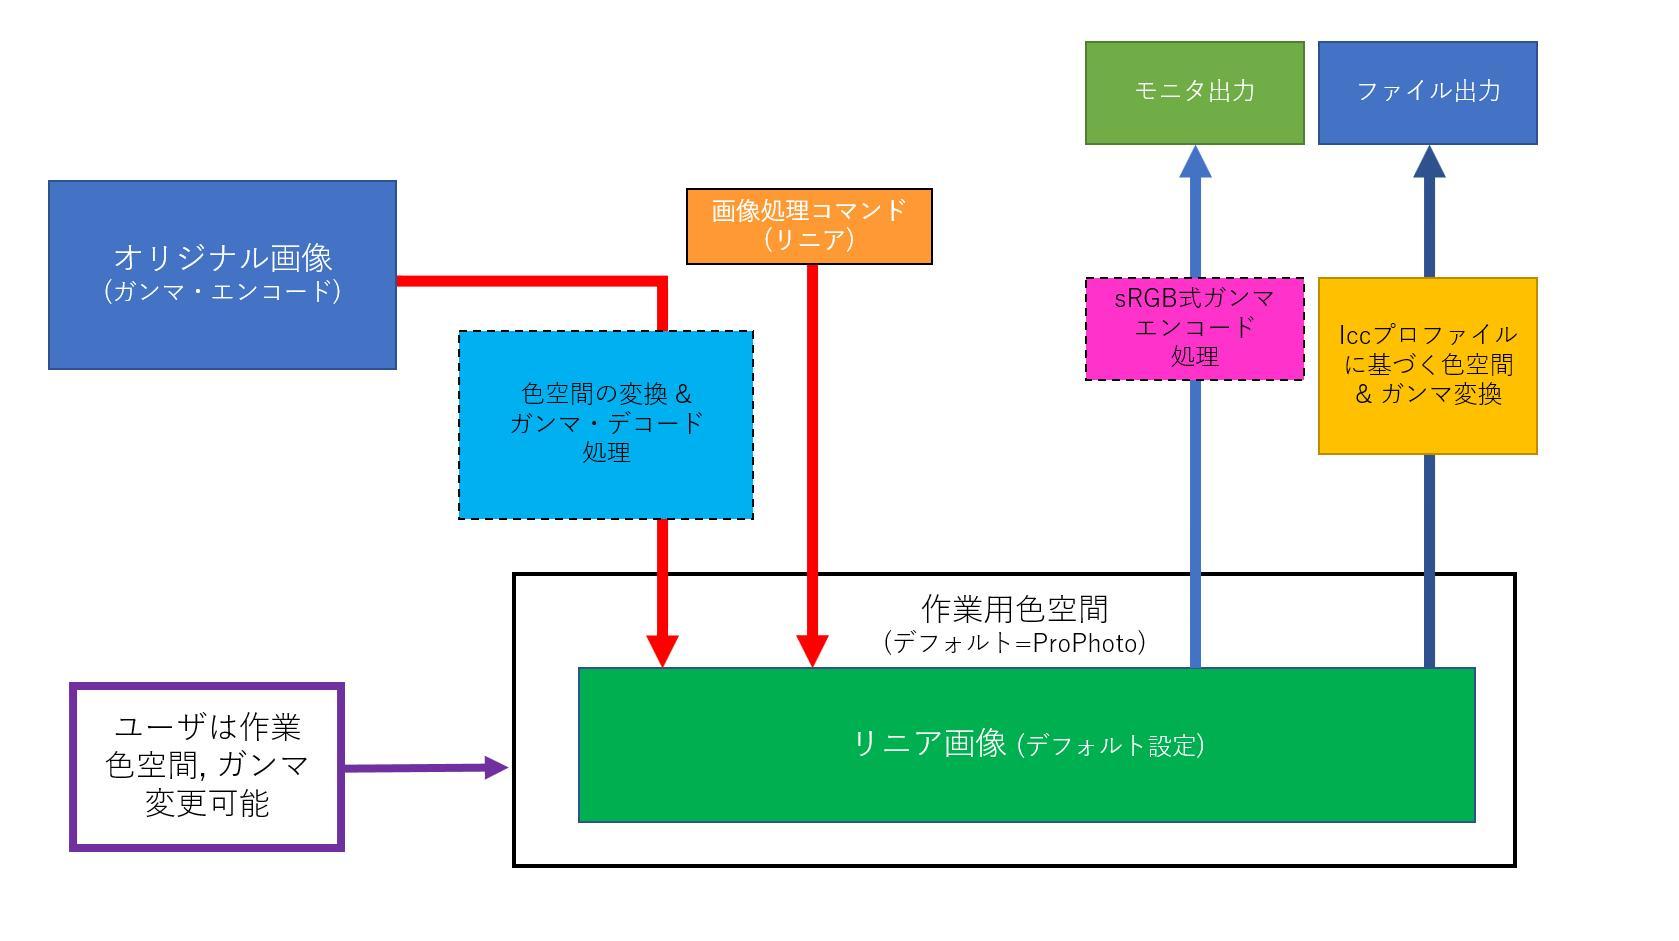 f:id:yasuo_ssi:20201127112026j:plain